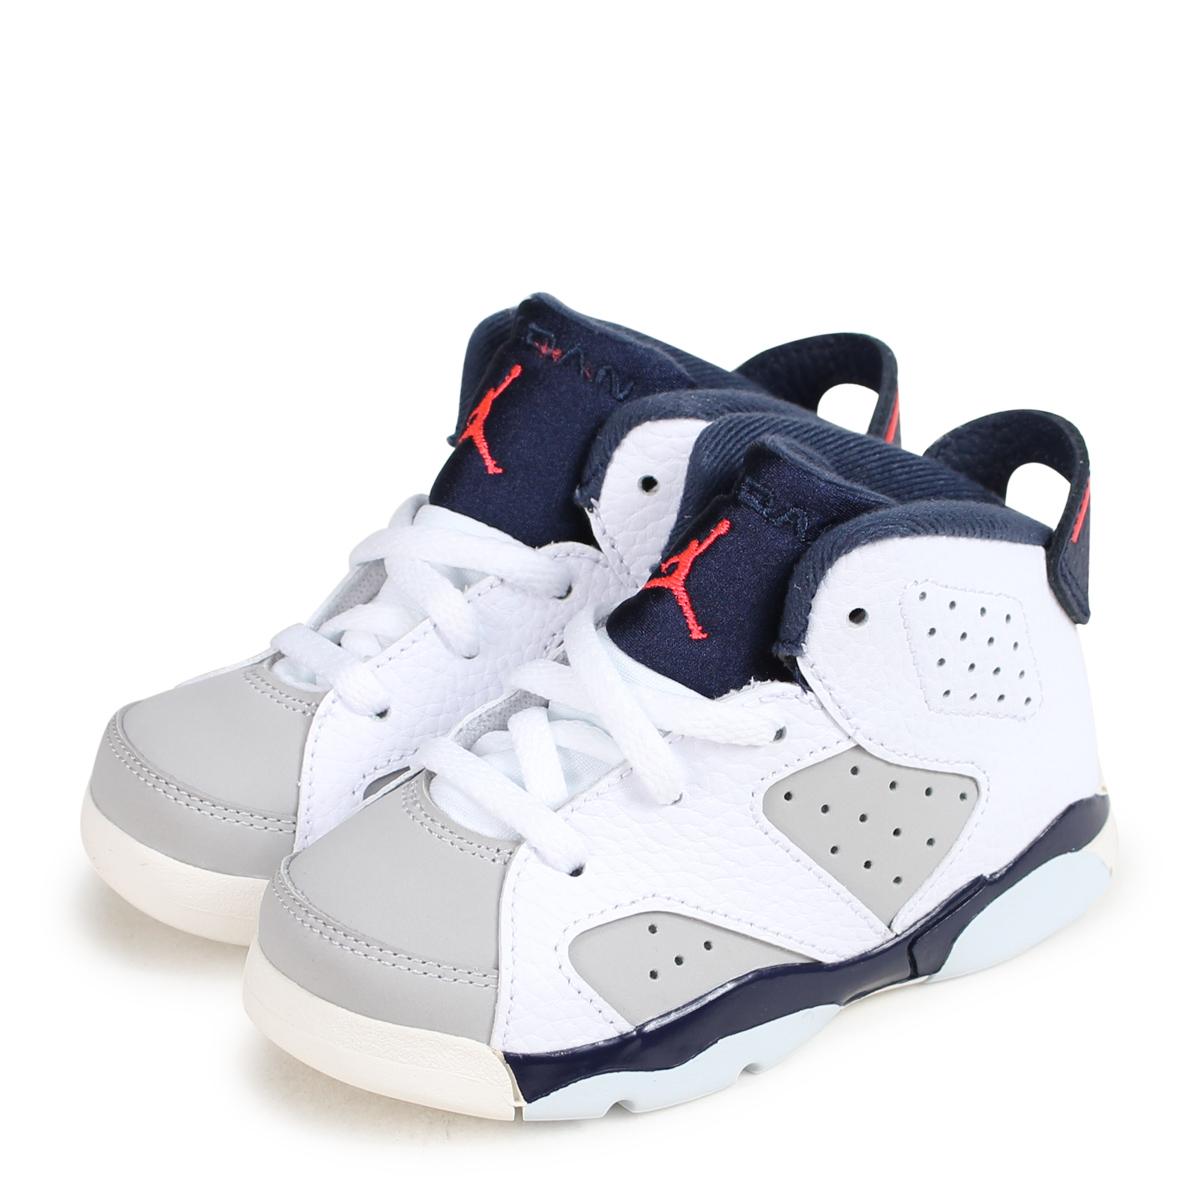 pretty nice d647e 4fd2a NIKE AIR JORDAN 6 RETRO TD TINKER Nike Air Jordan 6 nostalgic baby sneakers  384,667-104 white [load planned Shinnyu load in reservation product 10/22  ...